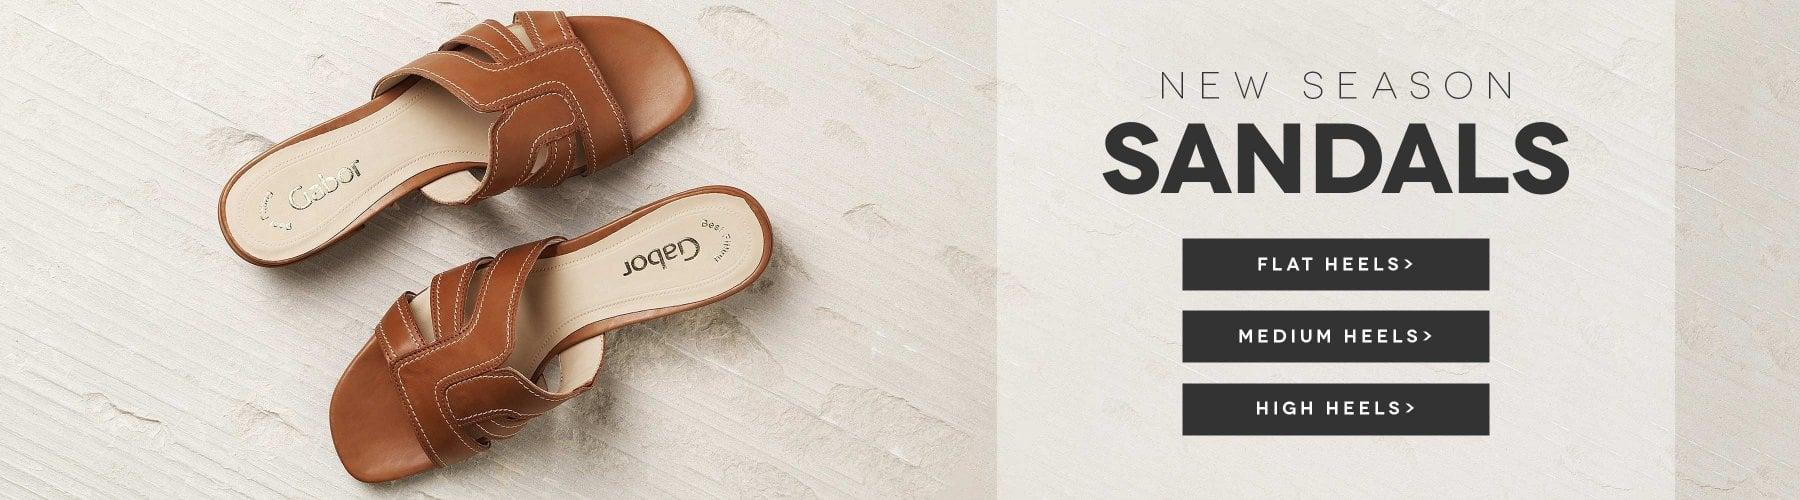 New Season Sandals